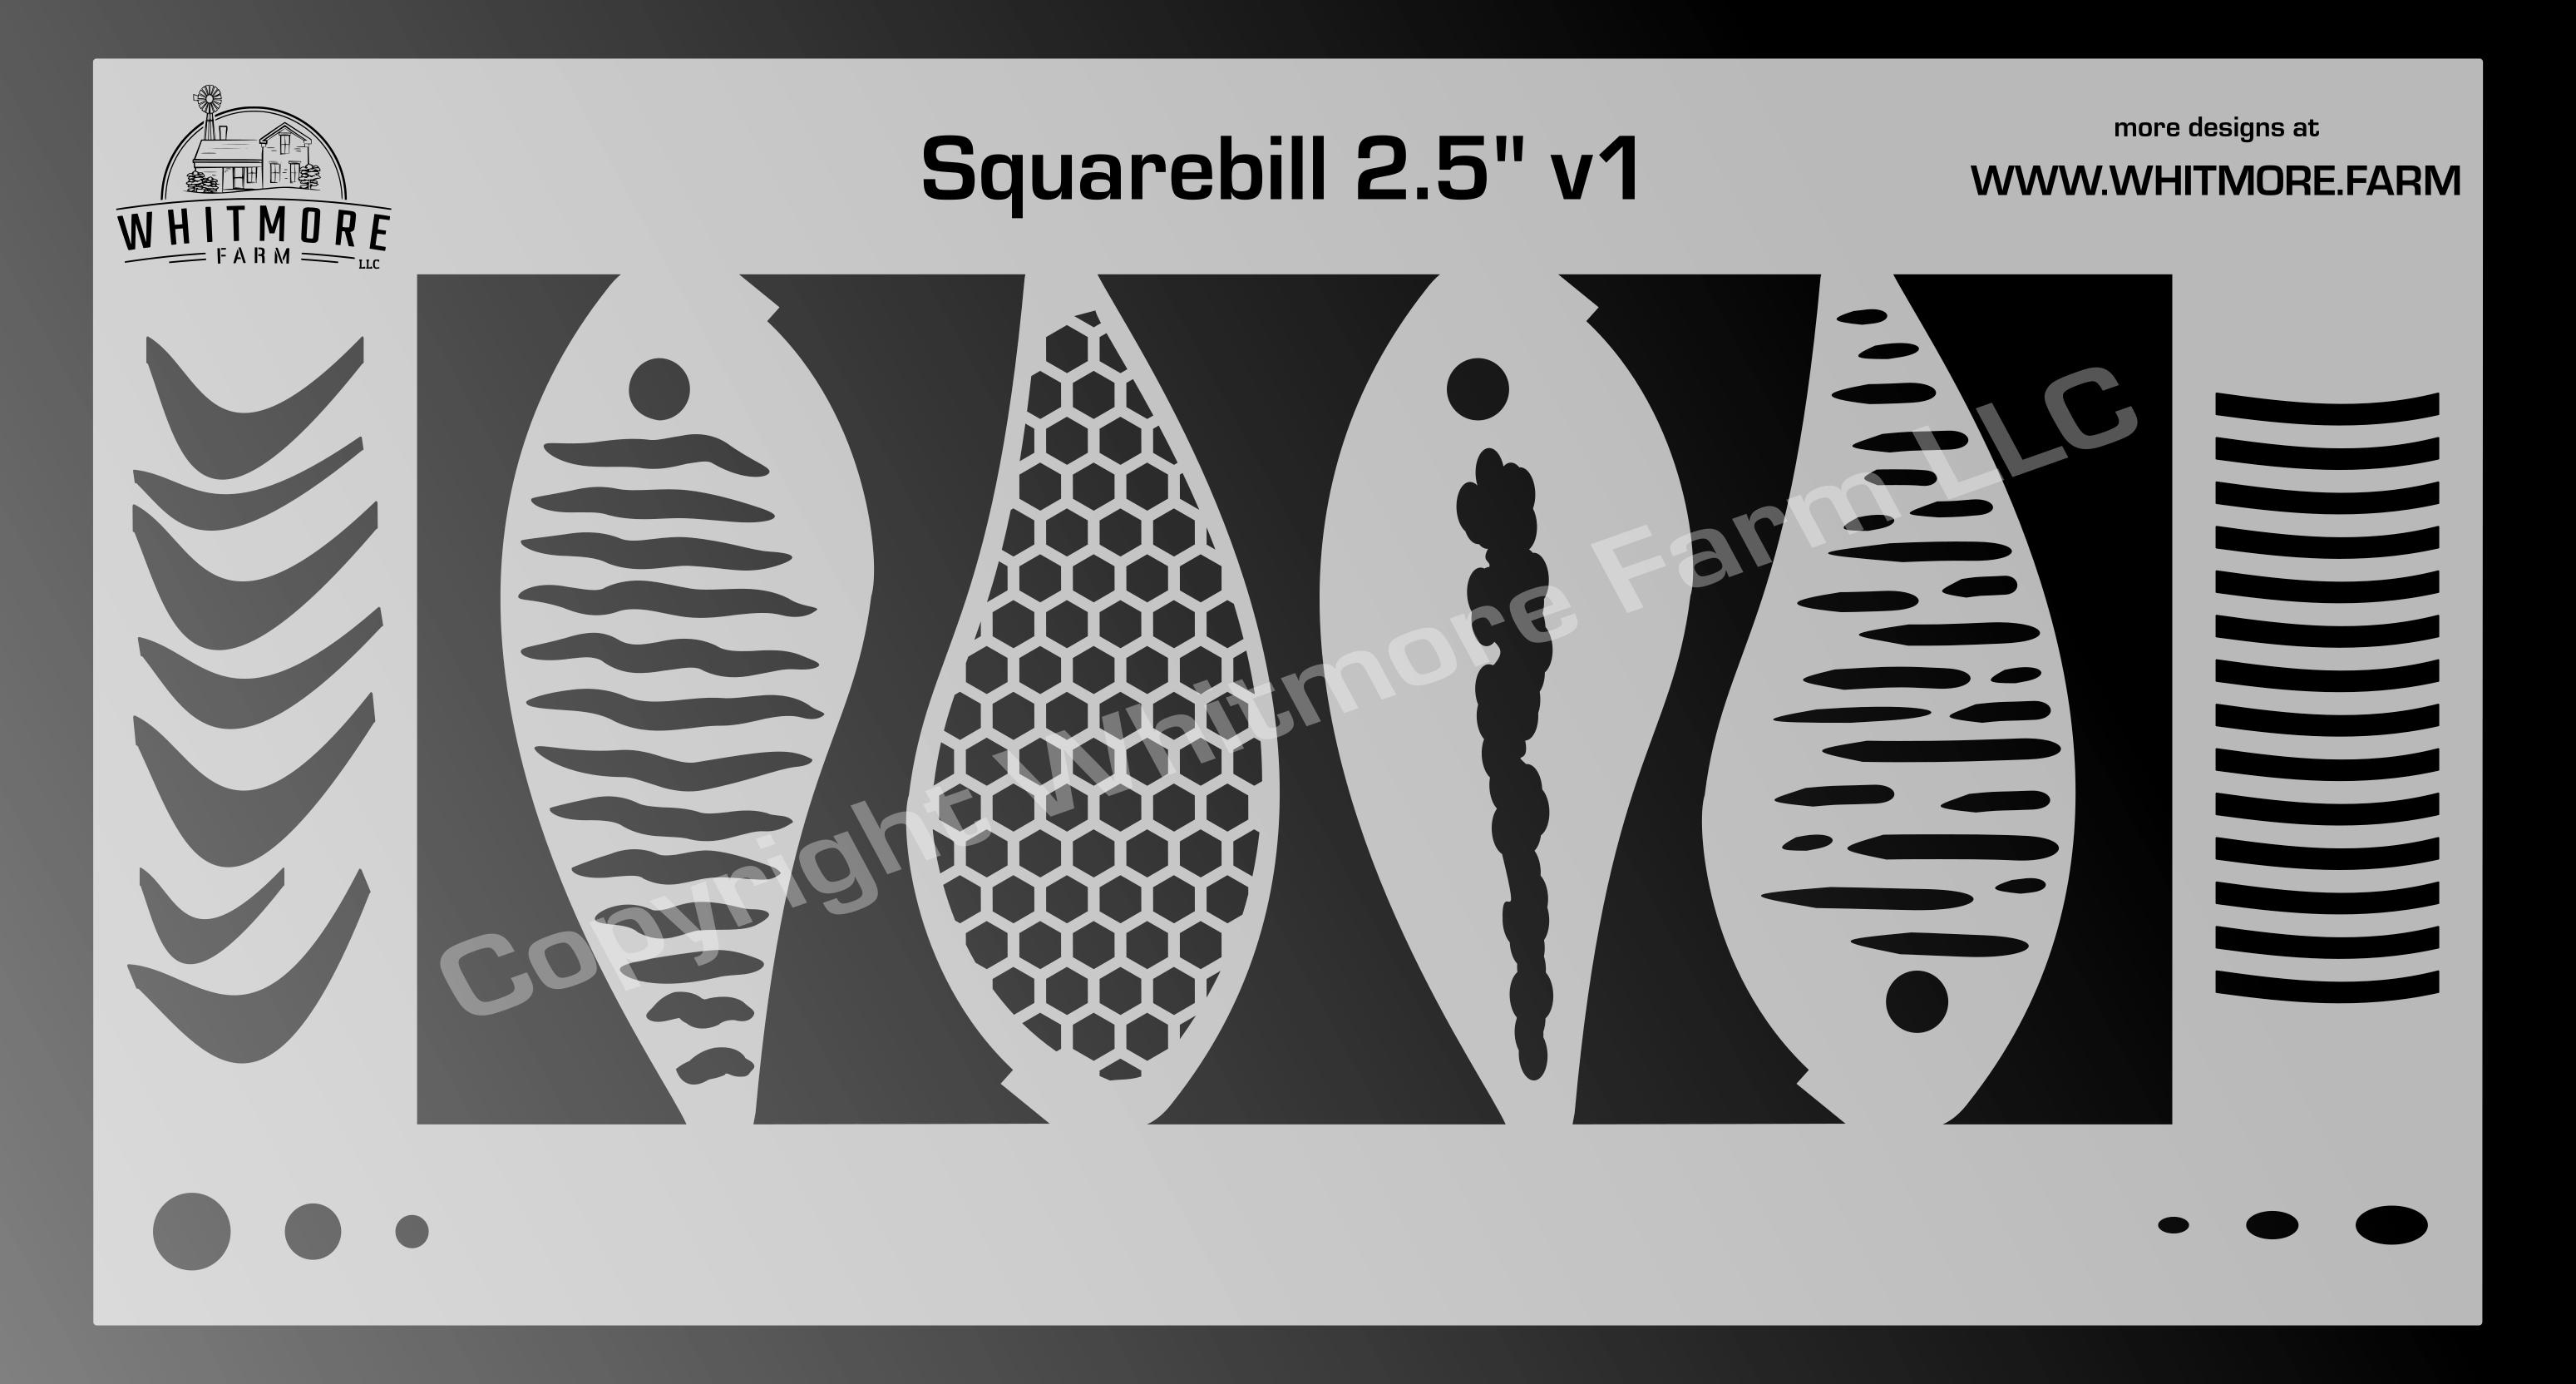 Squarebill fishing lure airbrush stencil - 2.5 Inch v2